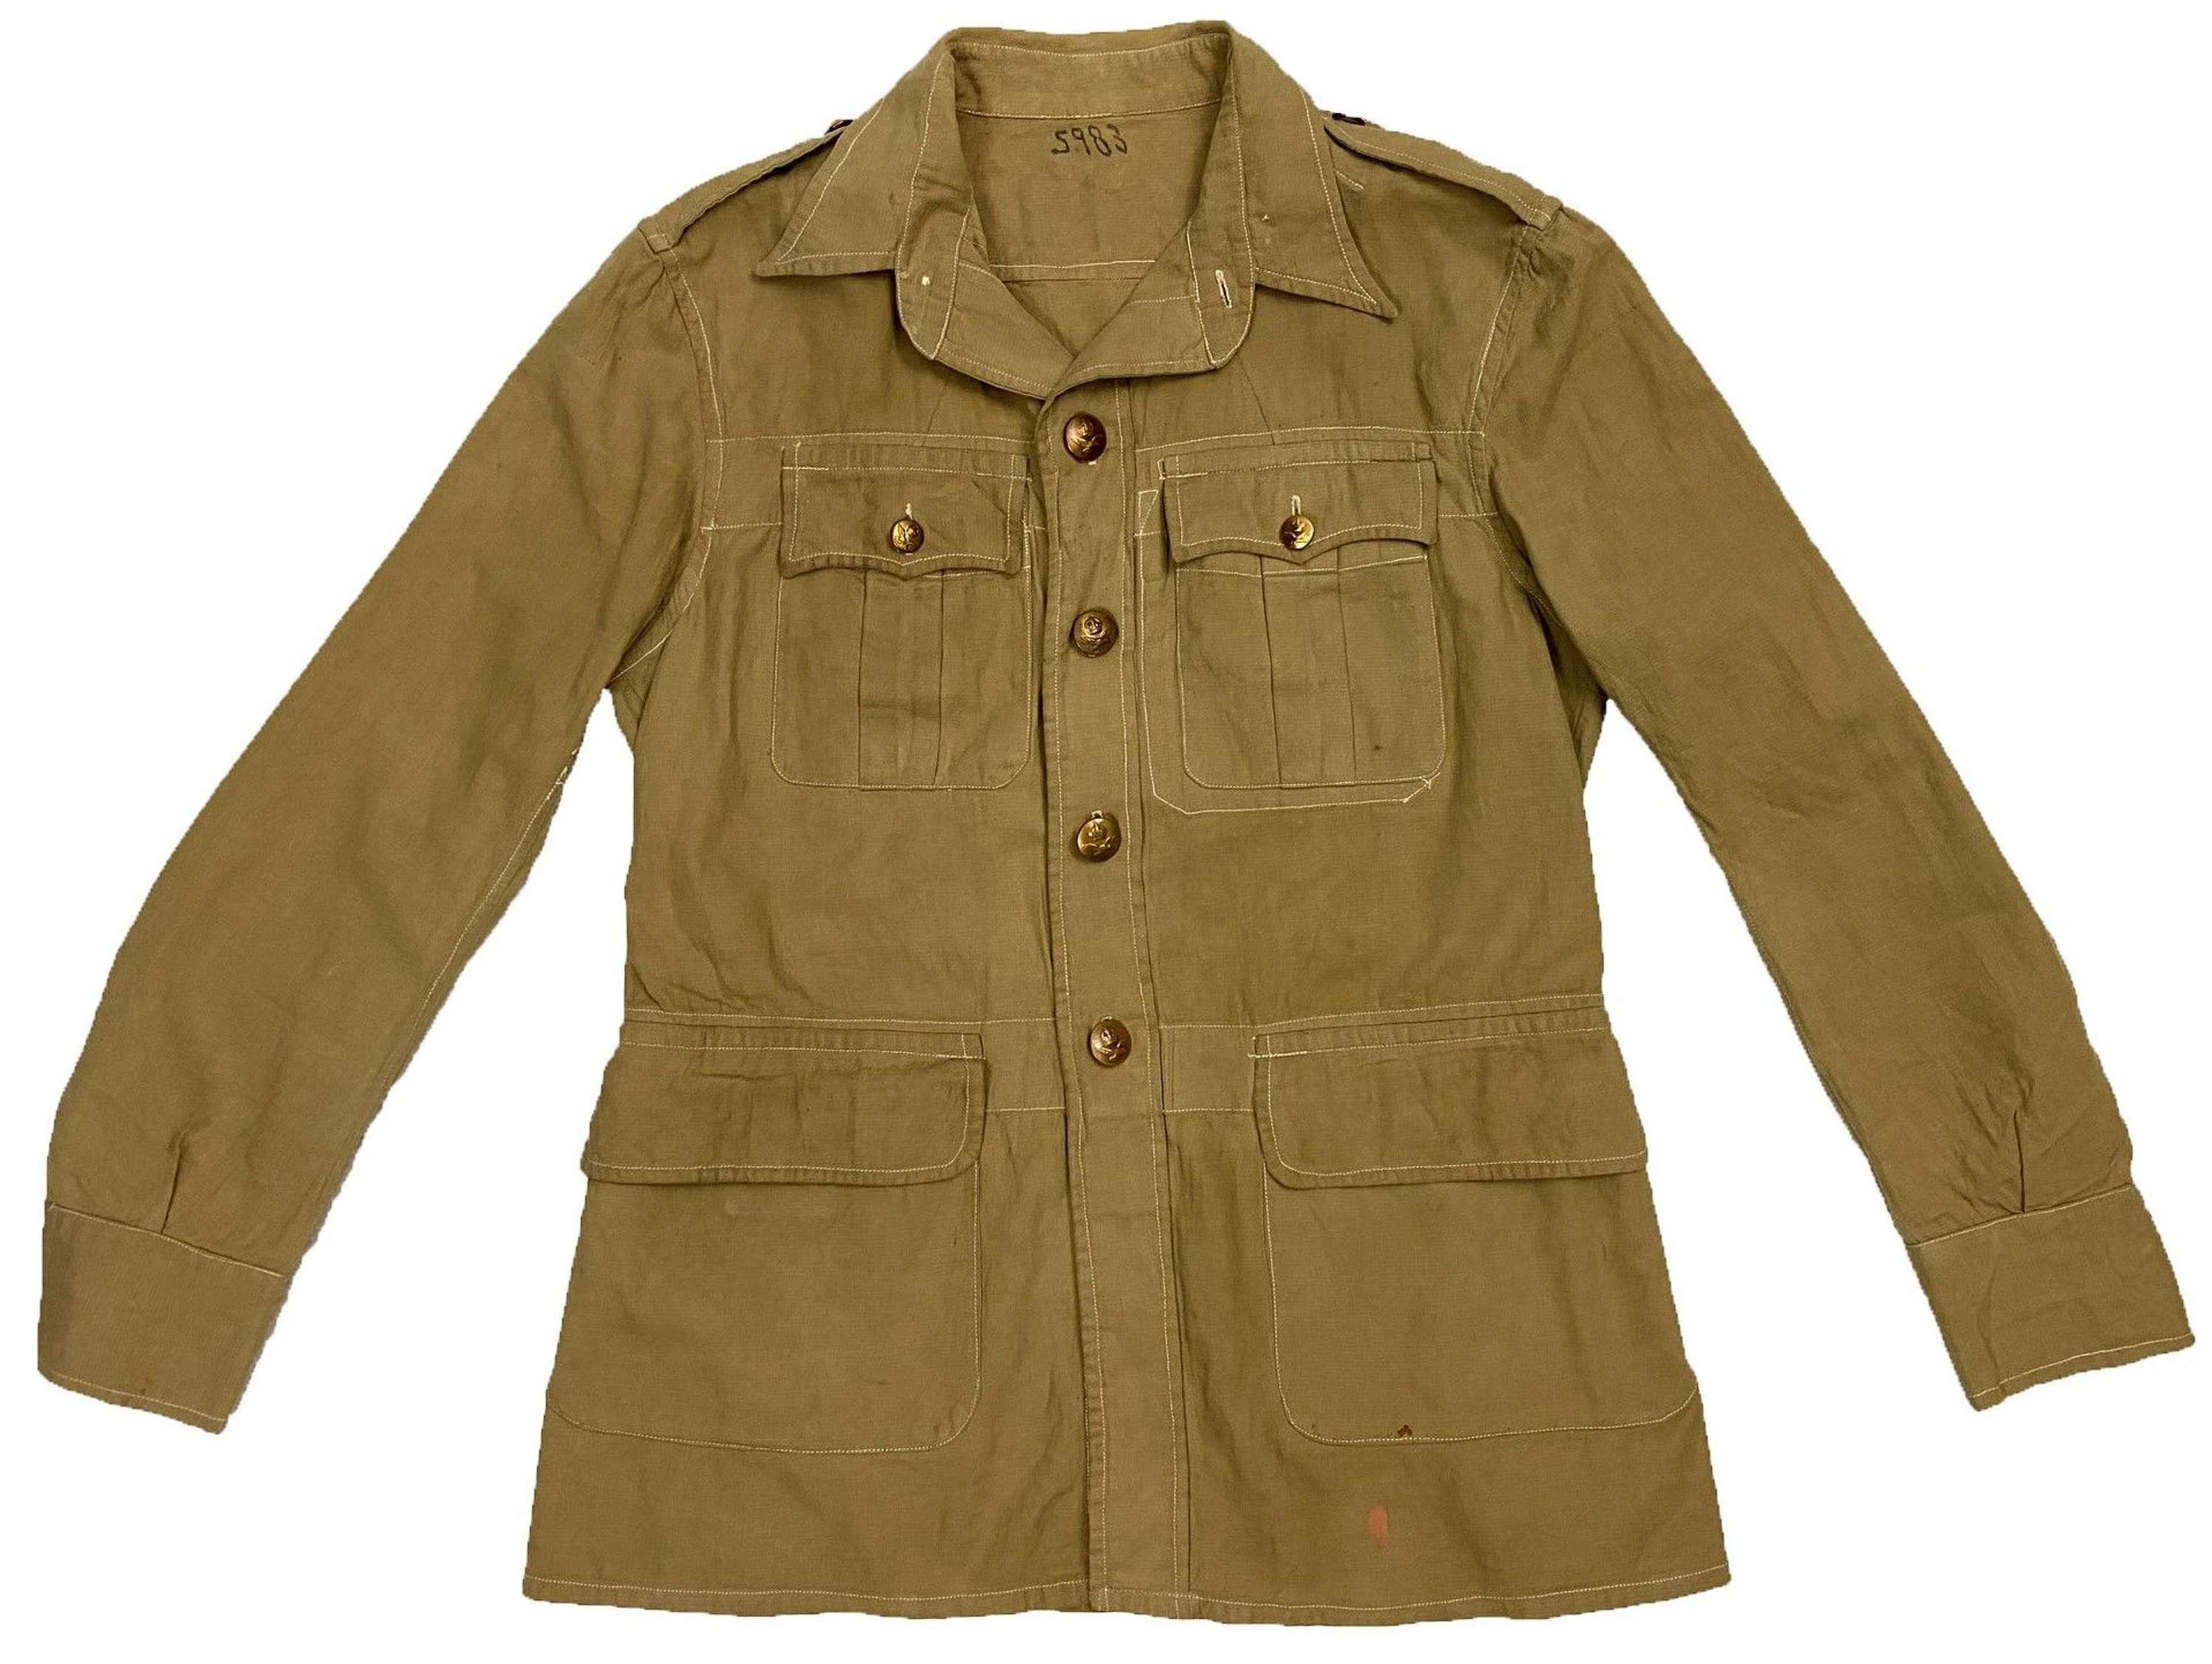 Original 1945 Dated RAF Khaki Drill Bush Jacket - Size 11